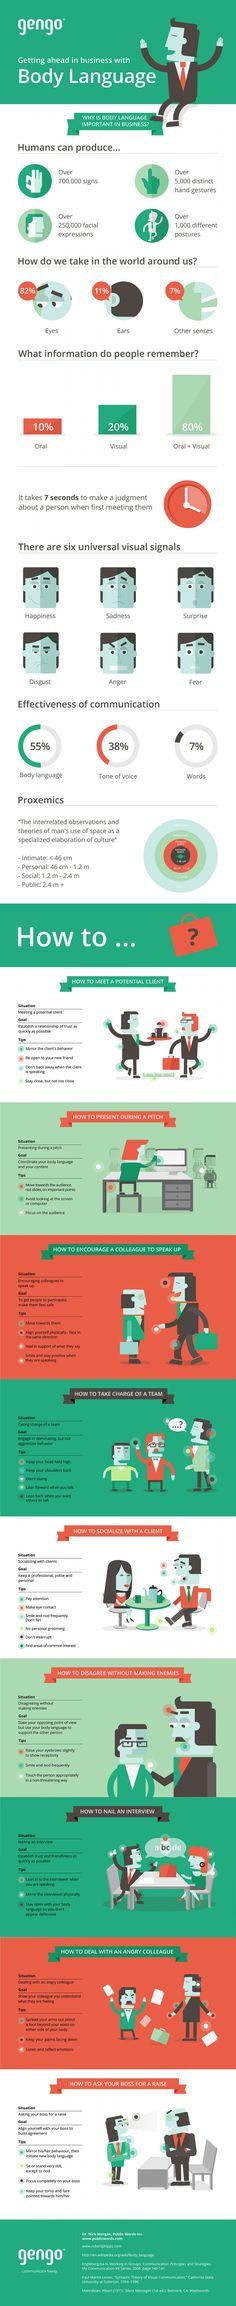 The Basics of Business Body Language (Infographic) | Inc.com